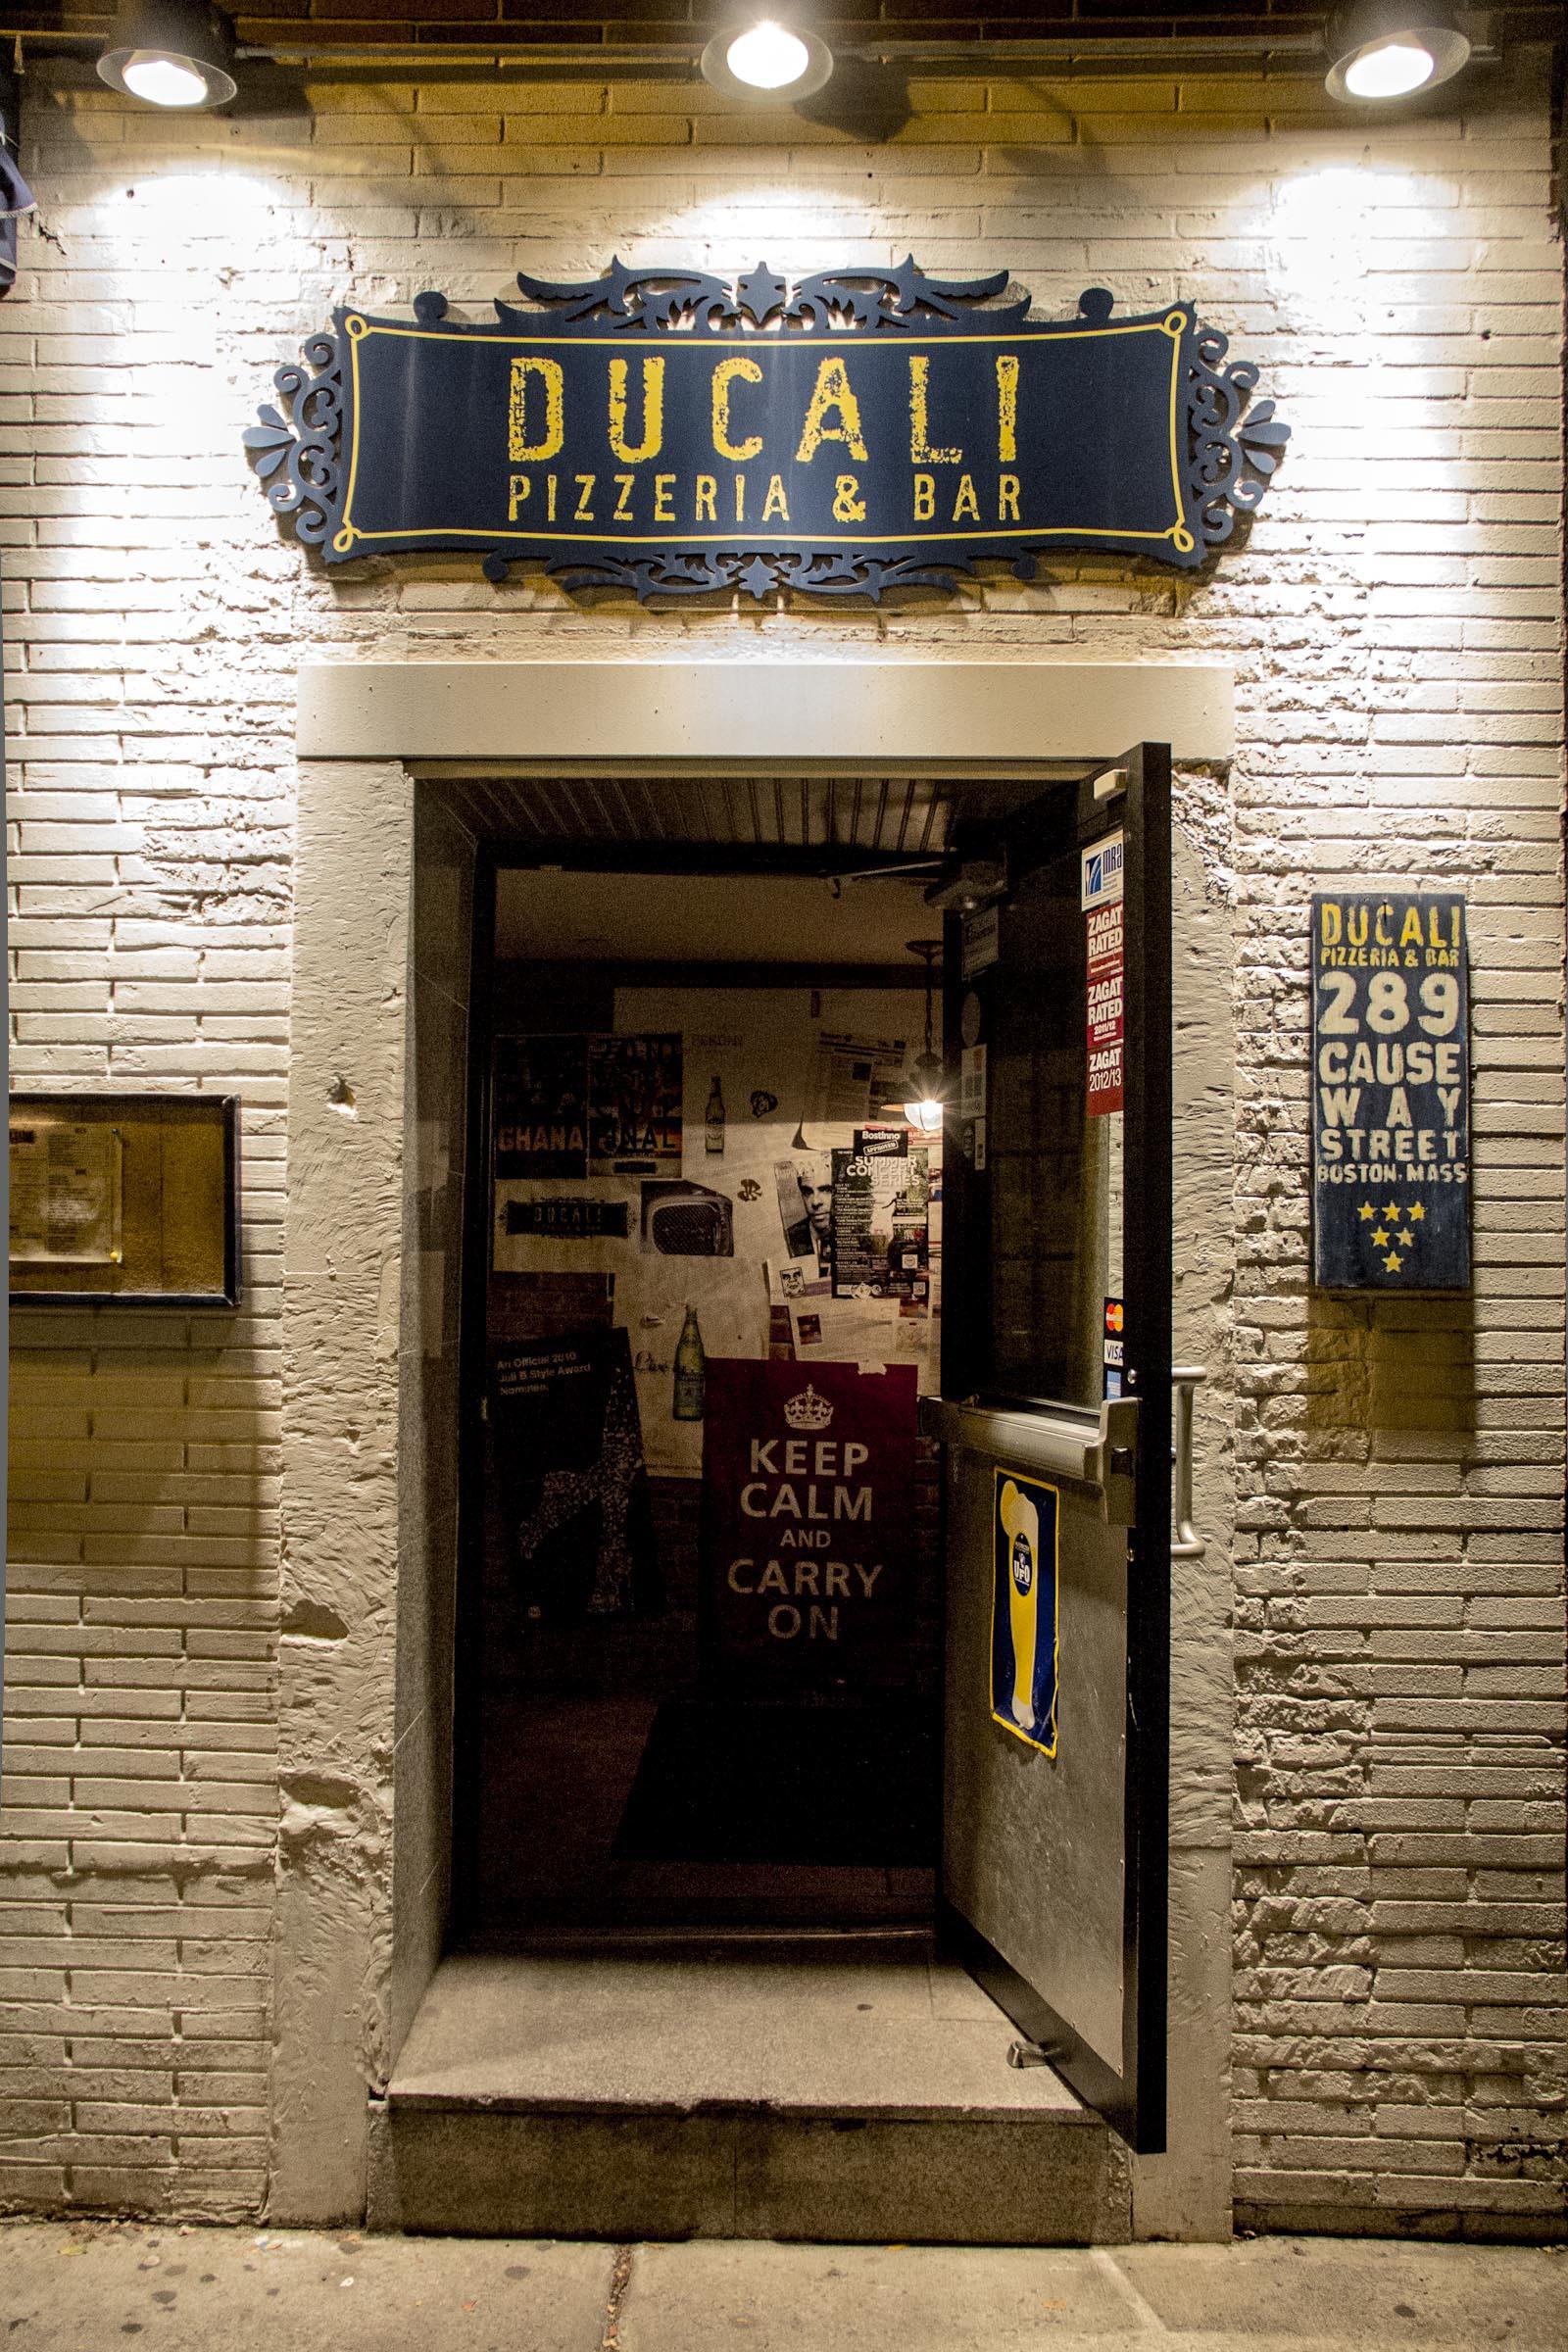 Ducali Pizzeria Entrance - North End Boston